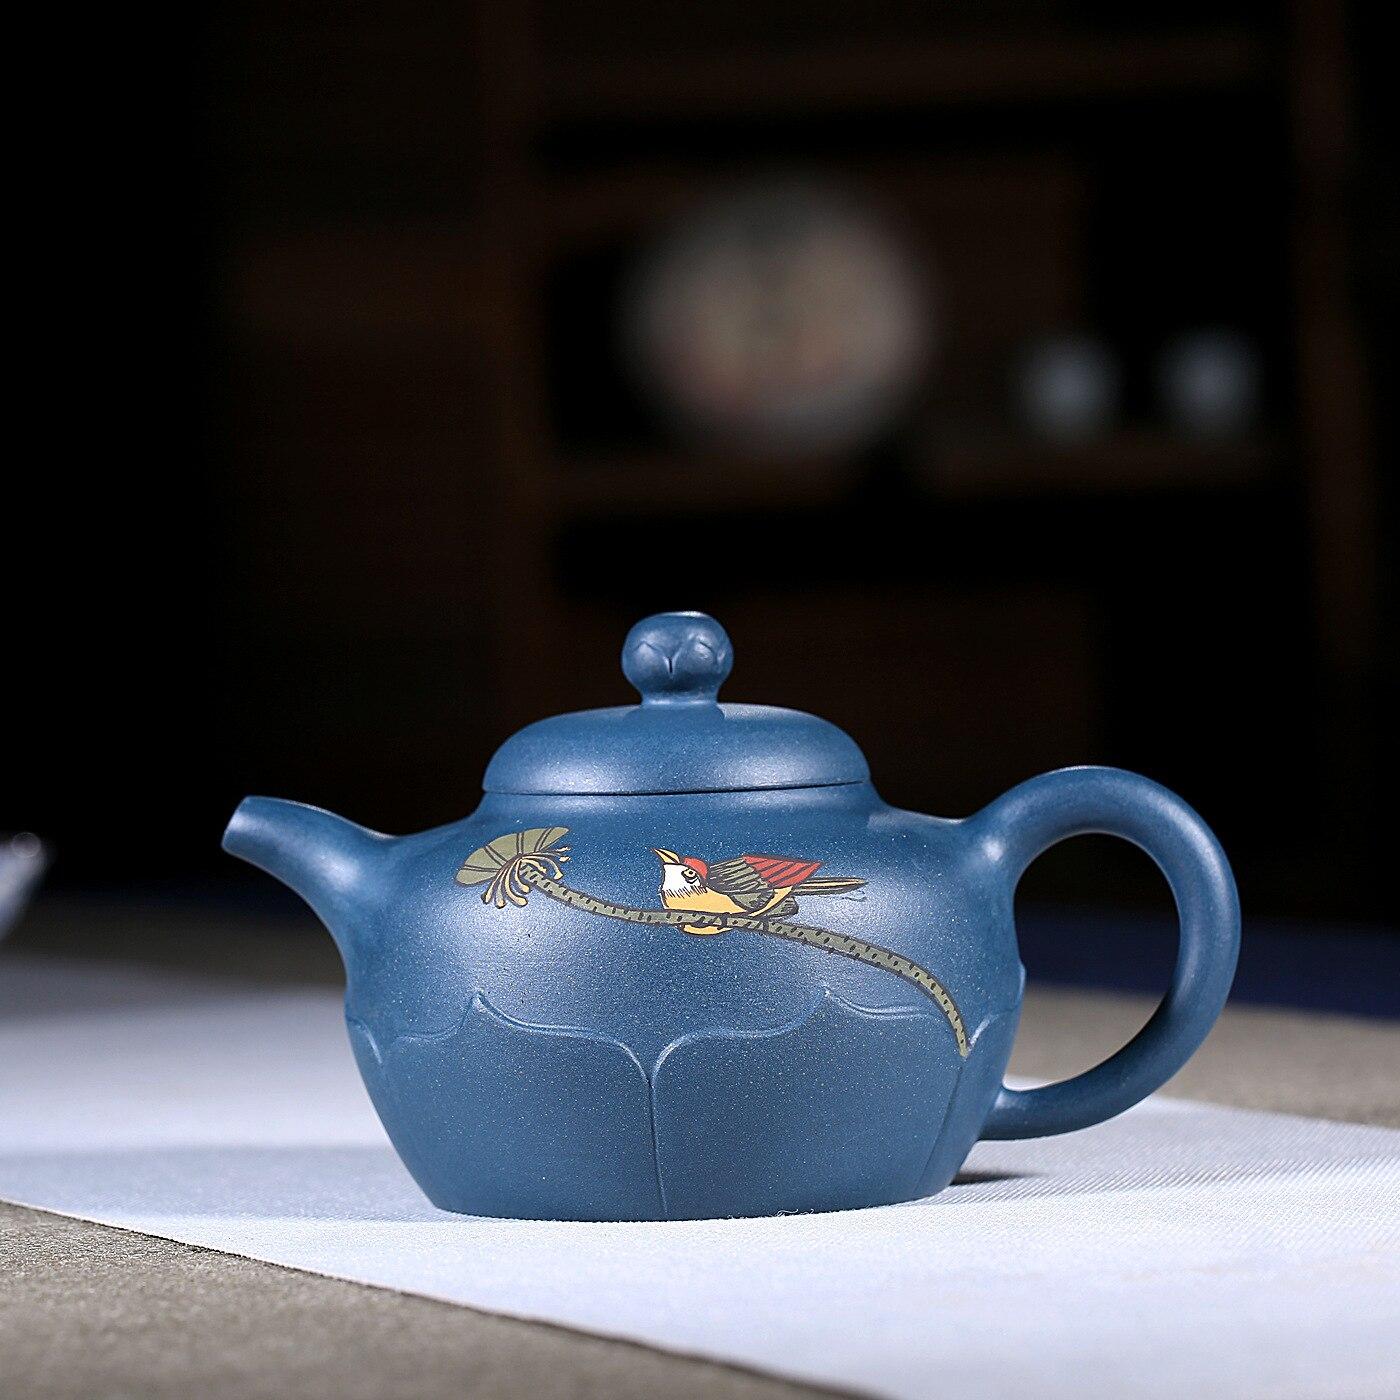 Enameled Pottery Teapot Full Manual Azure Mud Magpie Teapot Kungfu Online Travel Tea Set Gift Infusion Of Tea Kettle Wholesale|Teapots| |  - title=